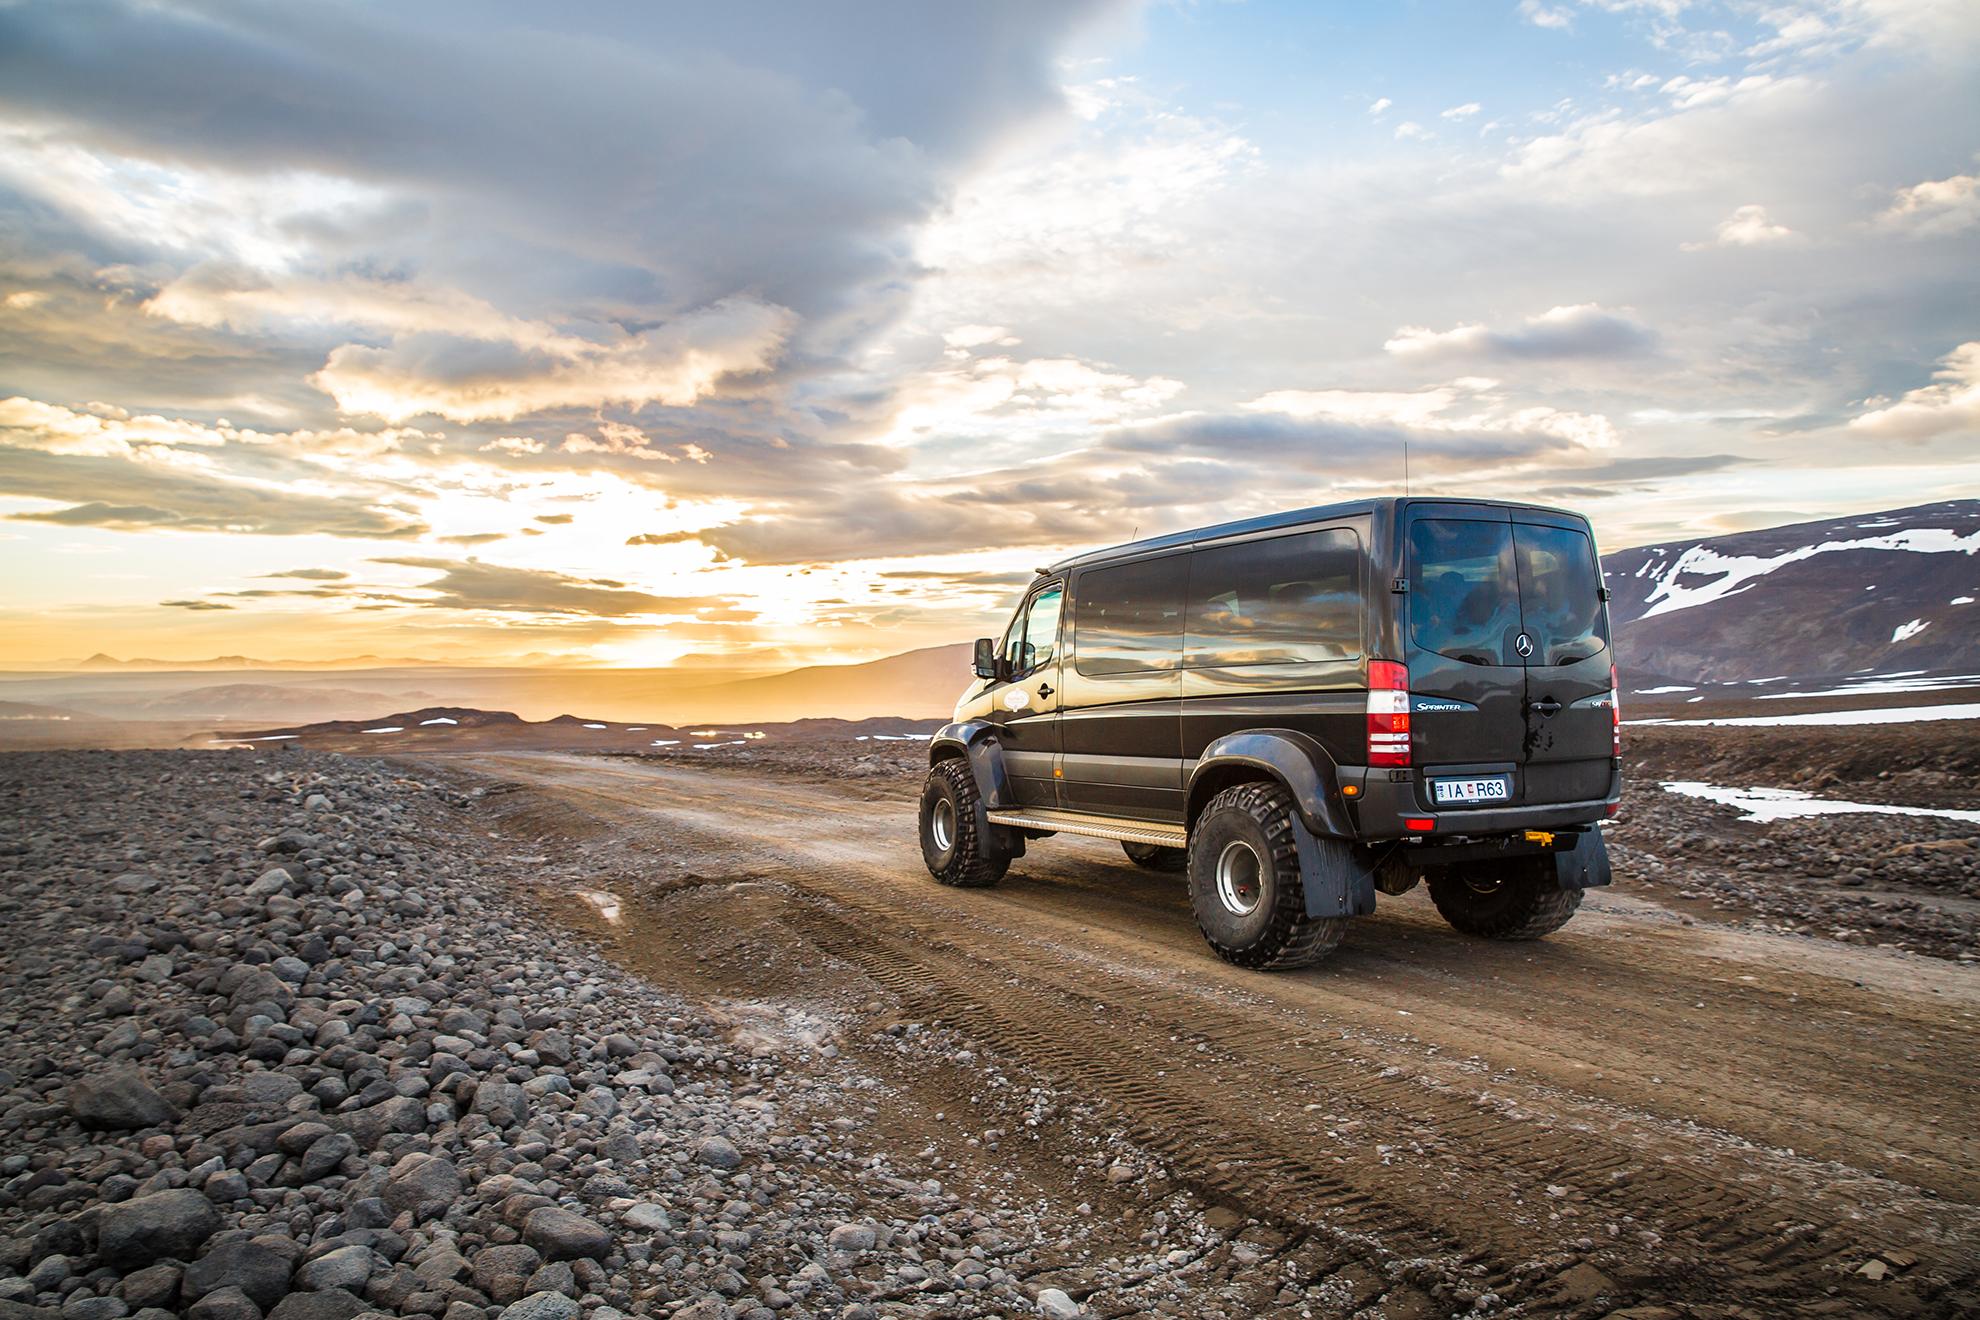 Highland Jeep Iceland Atlantik incentive cruise conference DMC PCO.jpg